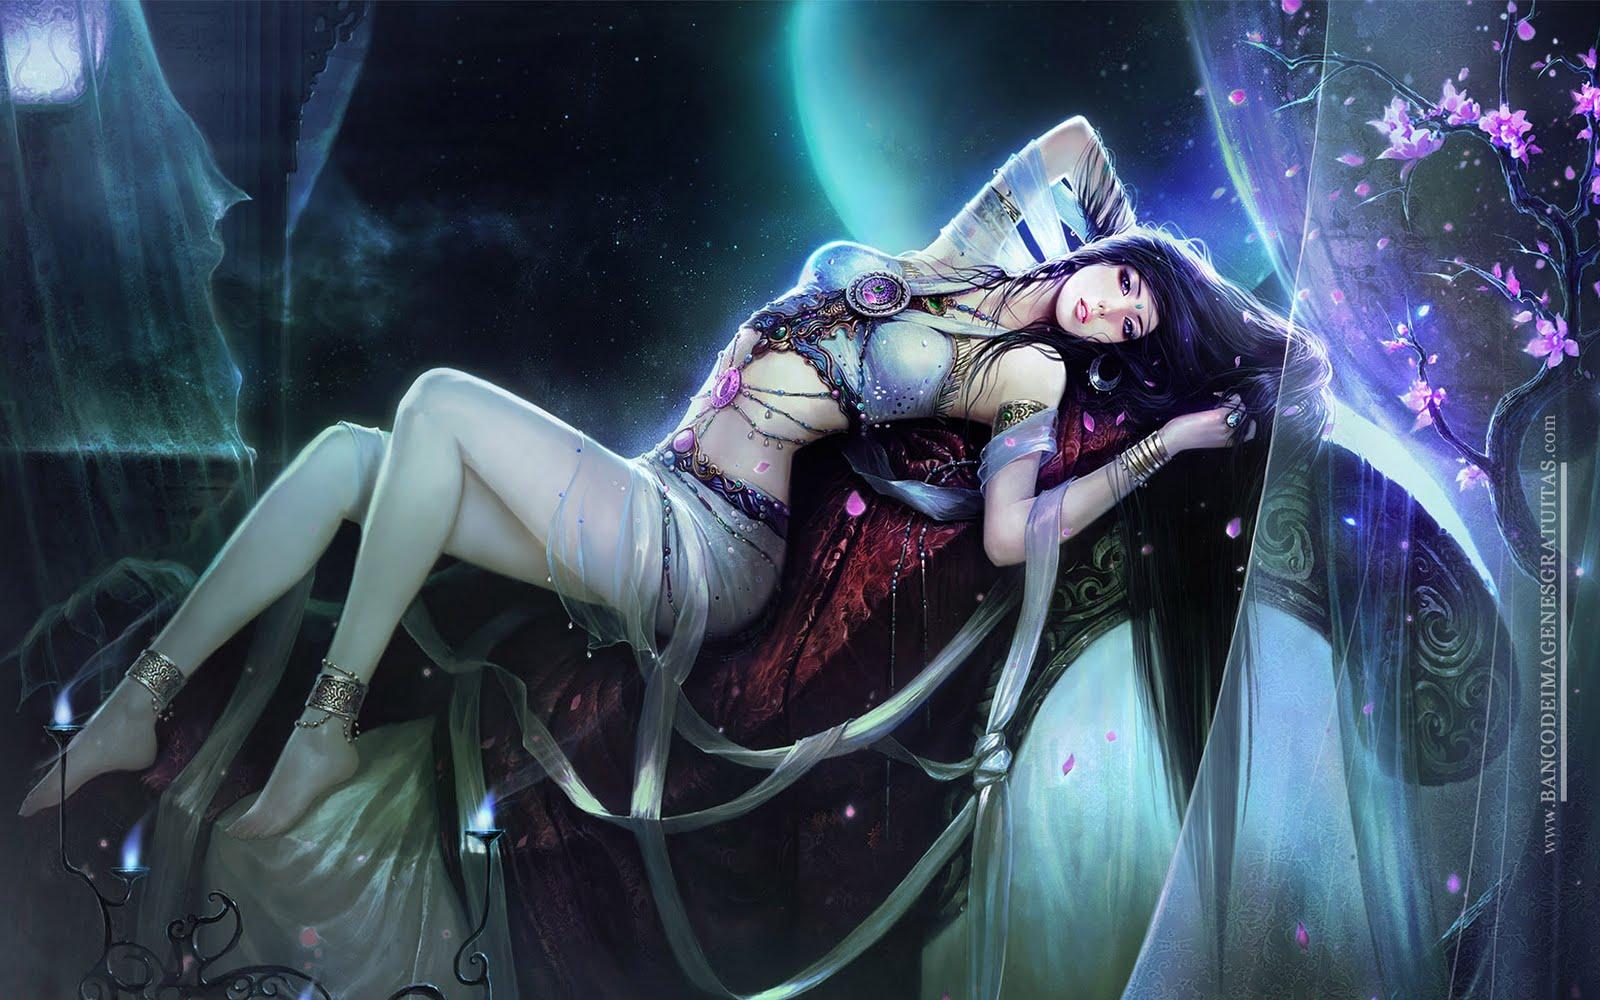 http://1.bp.blogspot.com/-A7VuuvLFONE/TfPRCQnC8pI/AAAAAAAAgcA/GNOvSmG7-pQ/s1600/fantasy-wallpapers-de-fantasia-2.jpg